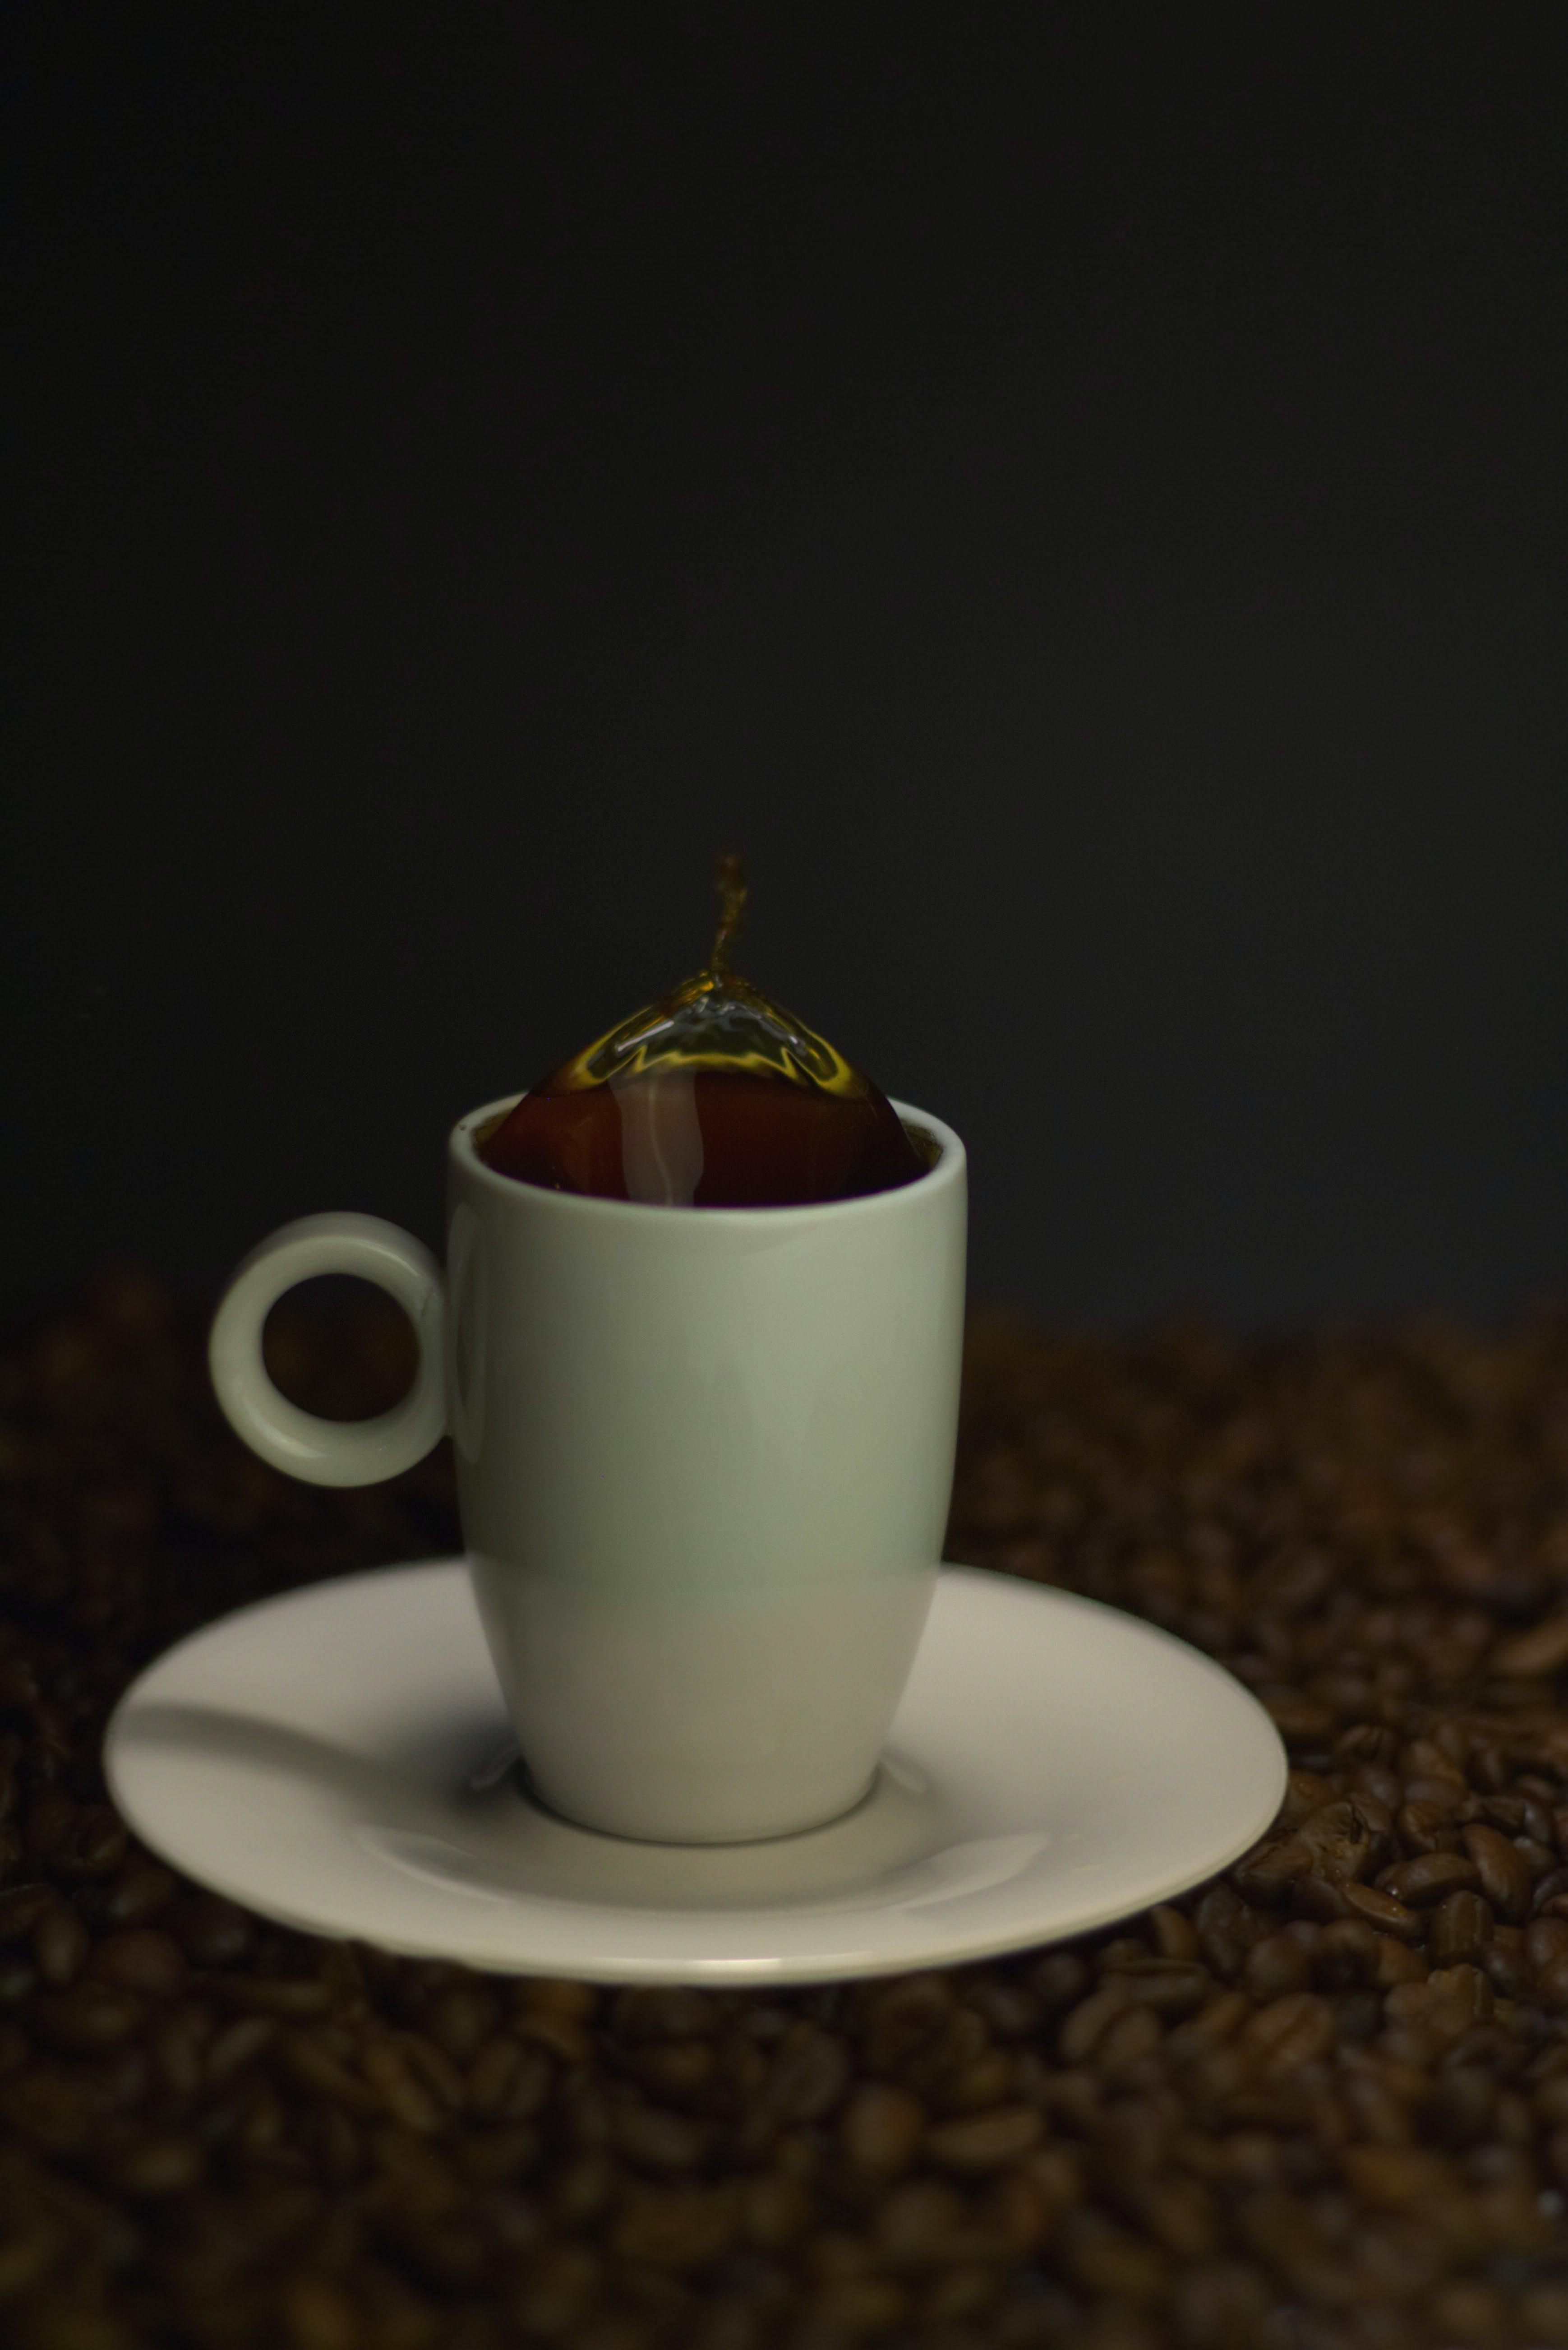 black coffee, coffee beans